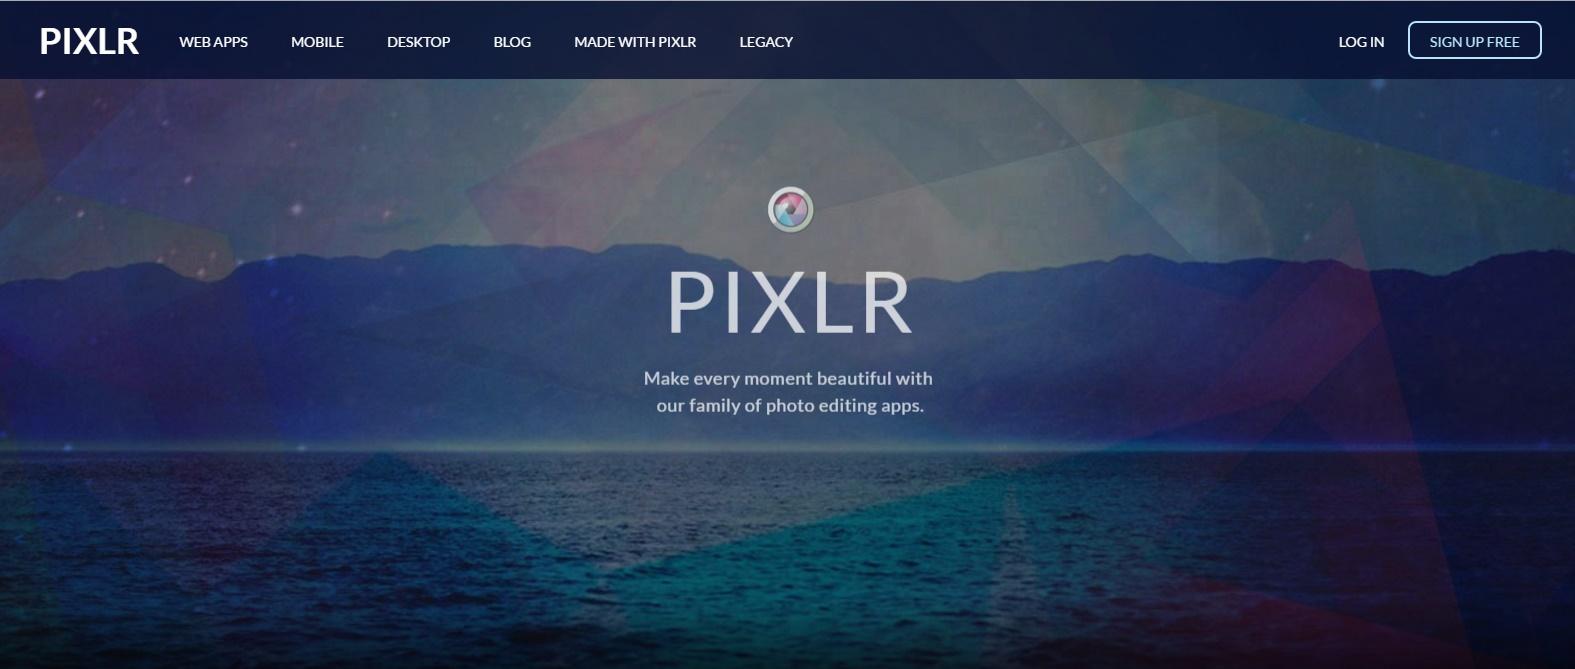 online photo editing website